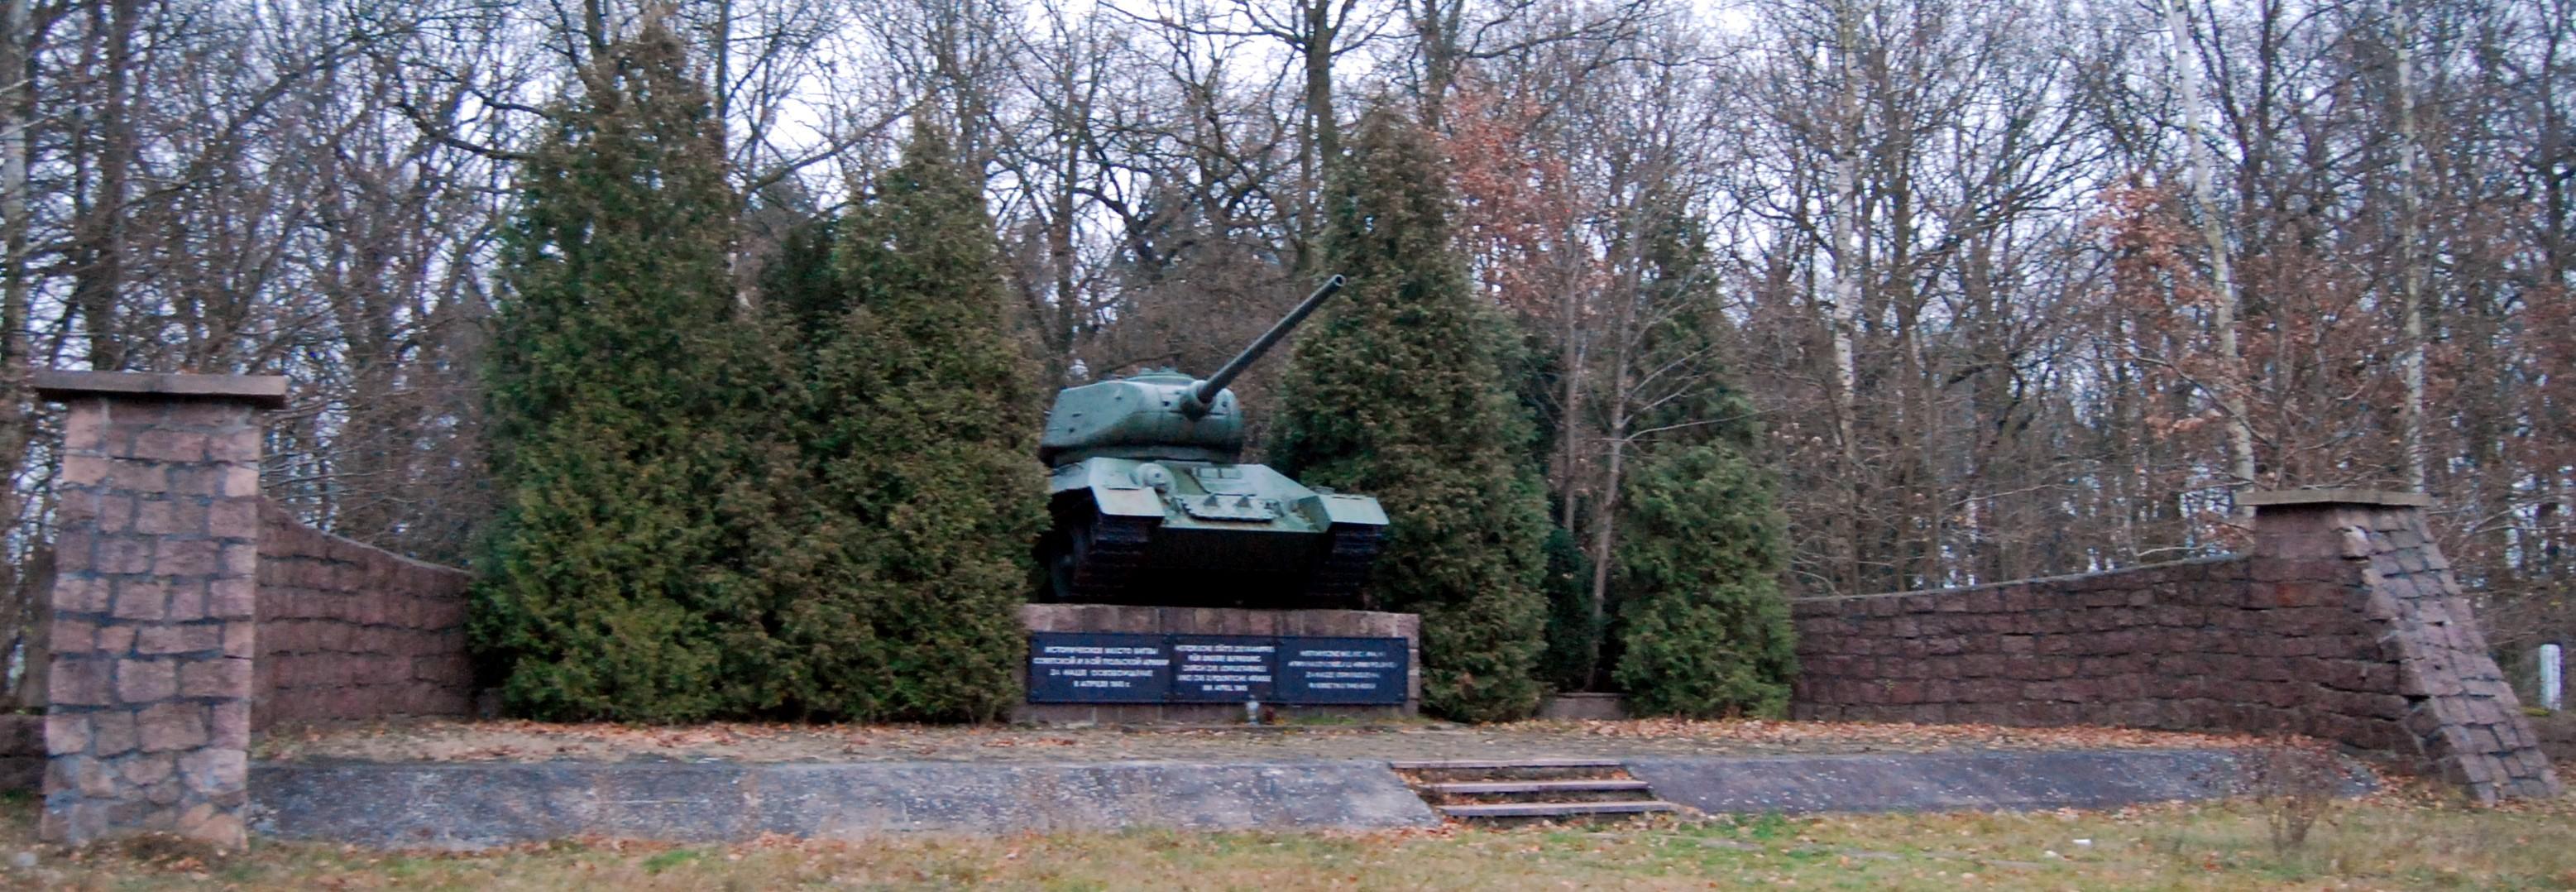 Panzer Rothenburg